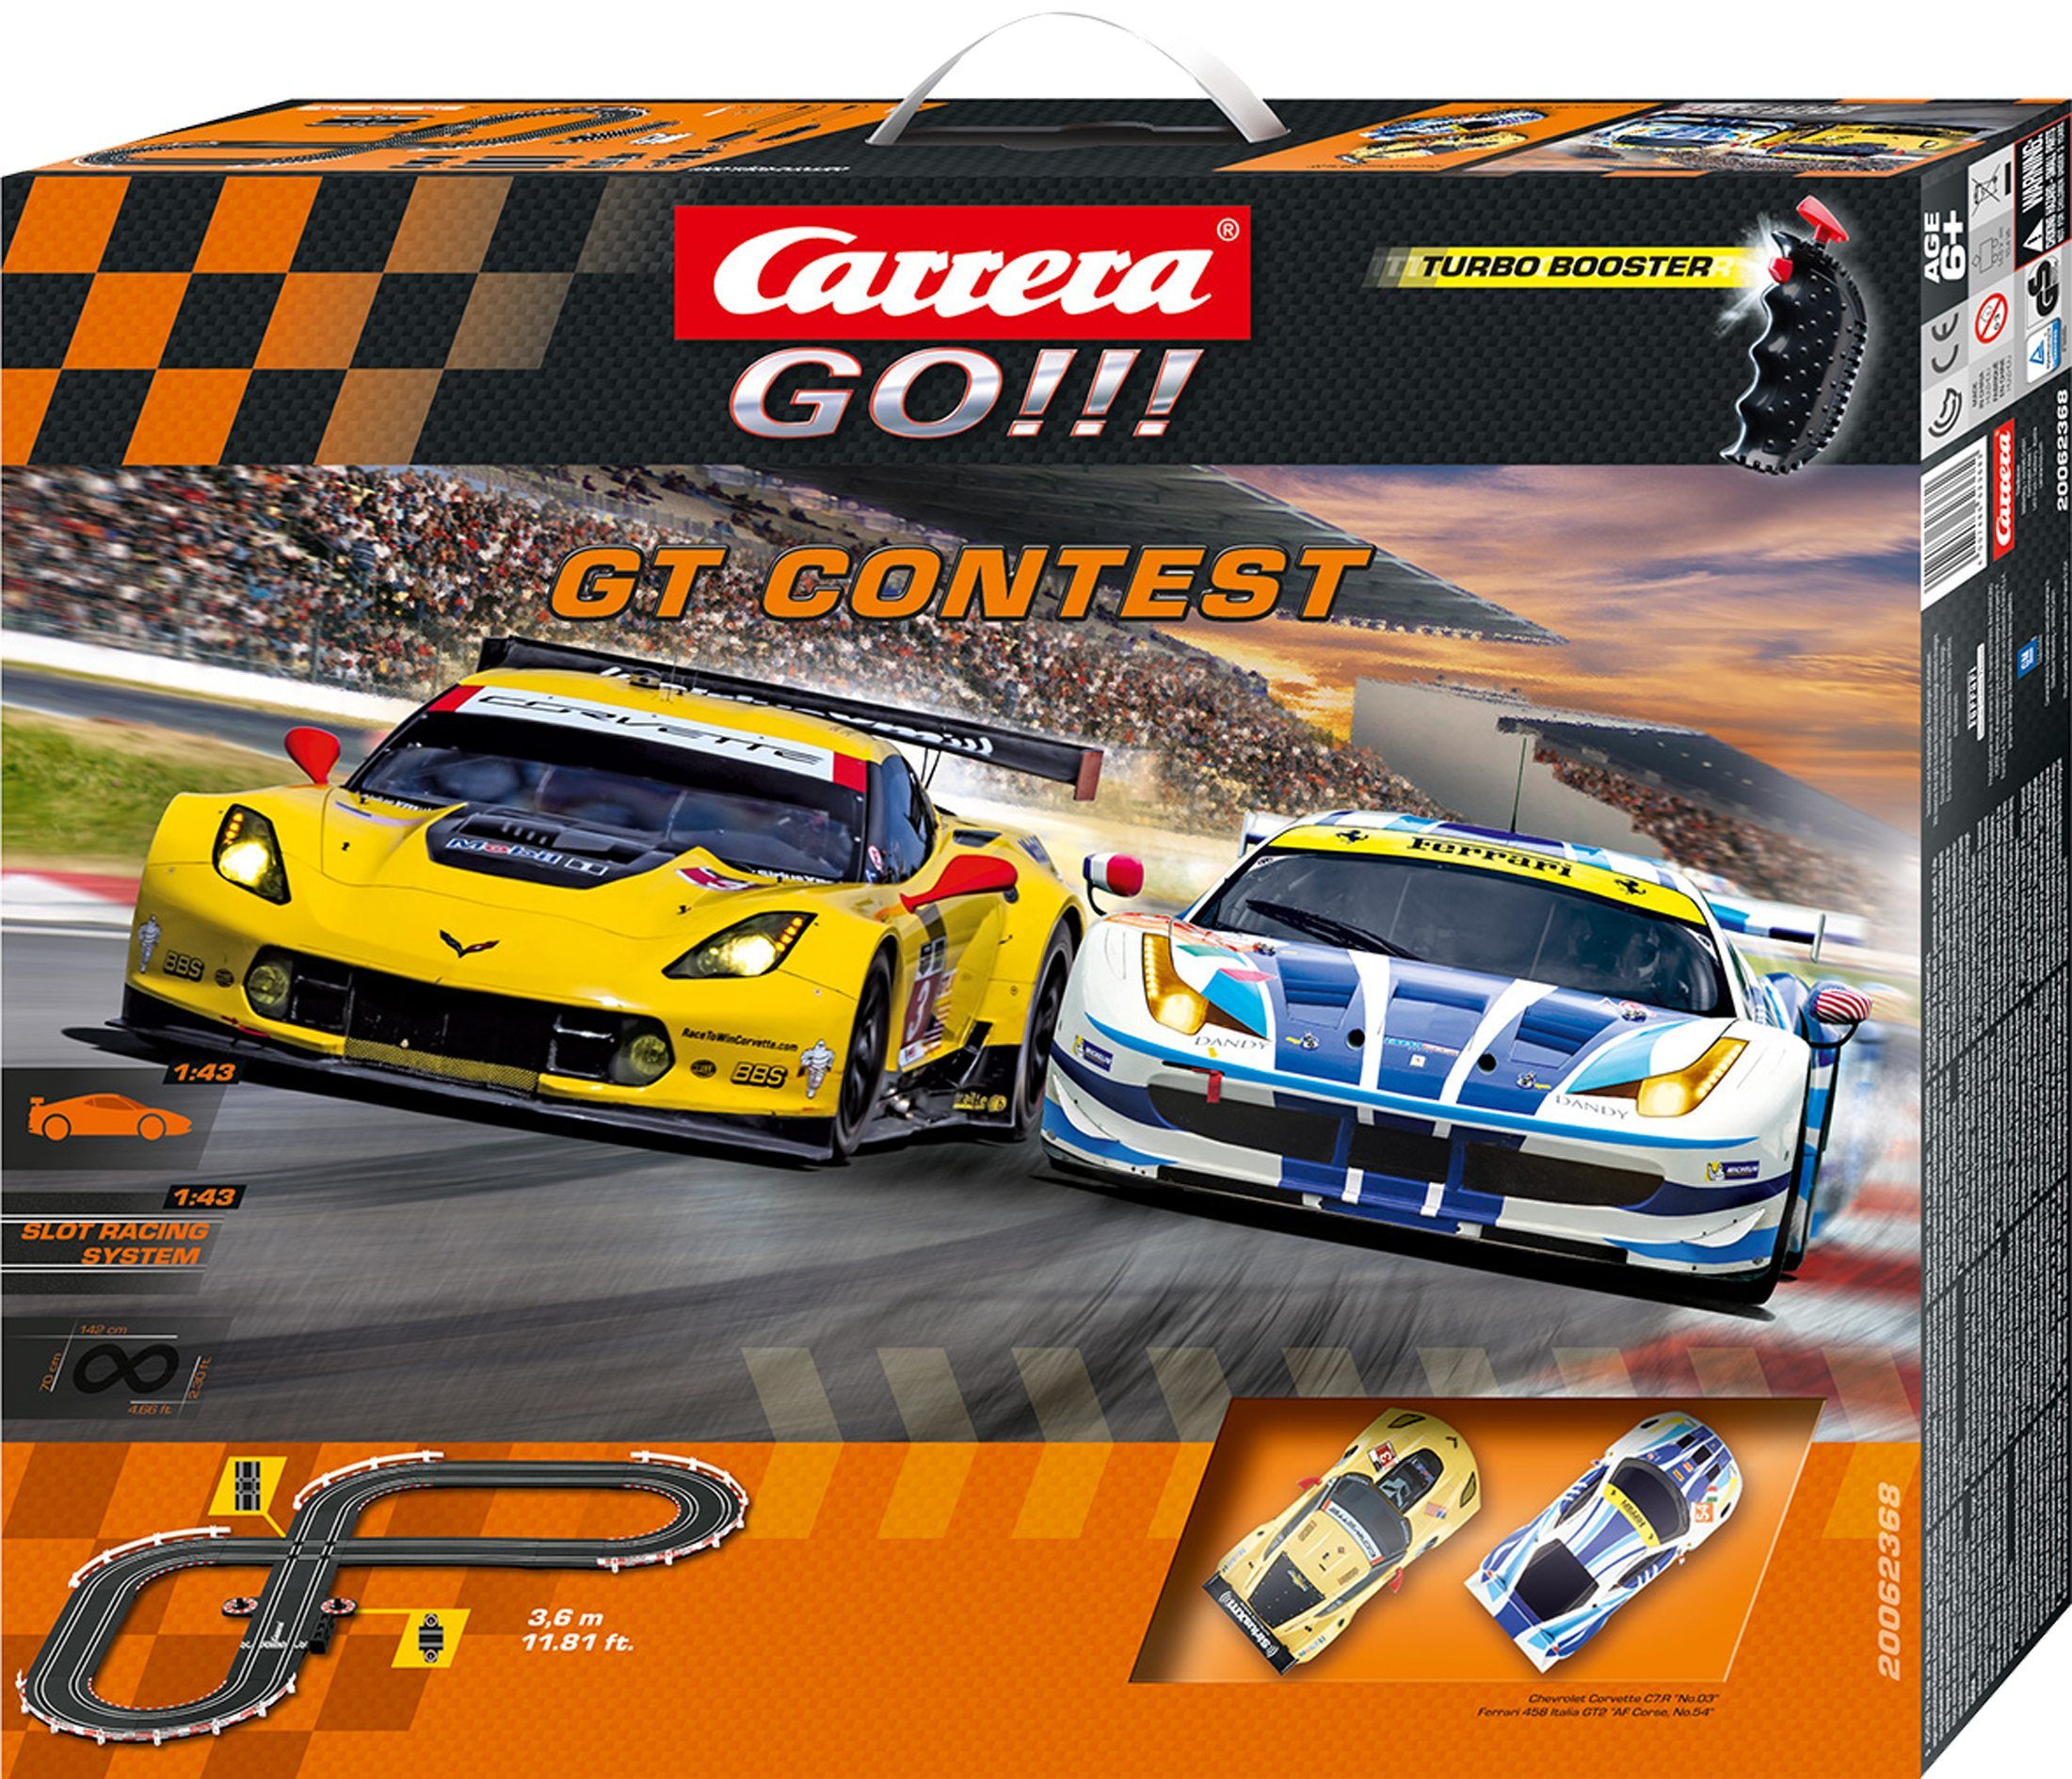 Carrera GO!!! GT Contest 1:43 Scale Electric Powered Slot Car Race Track Set - Corvette vs Ferrari by Carrera (Image #1)